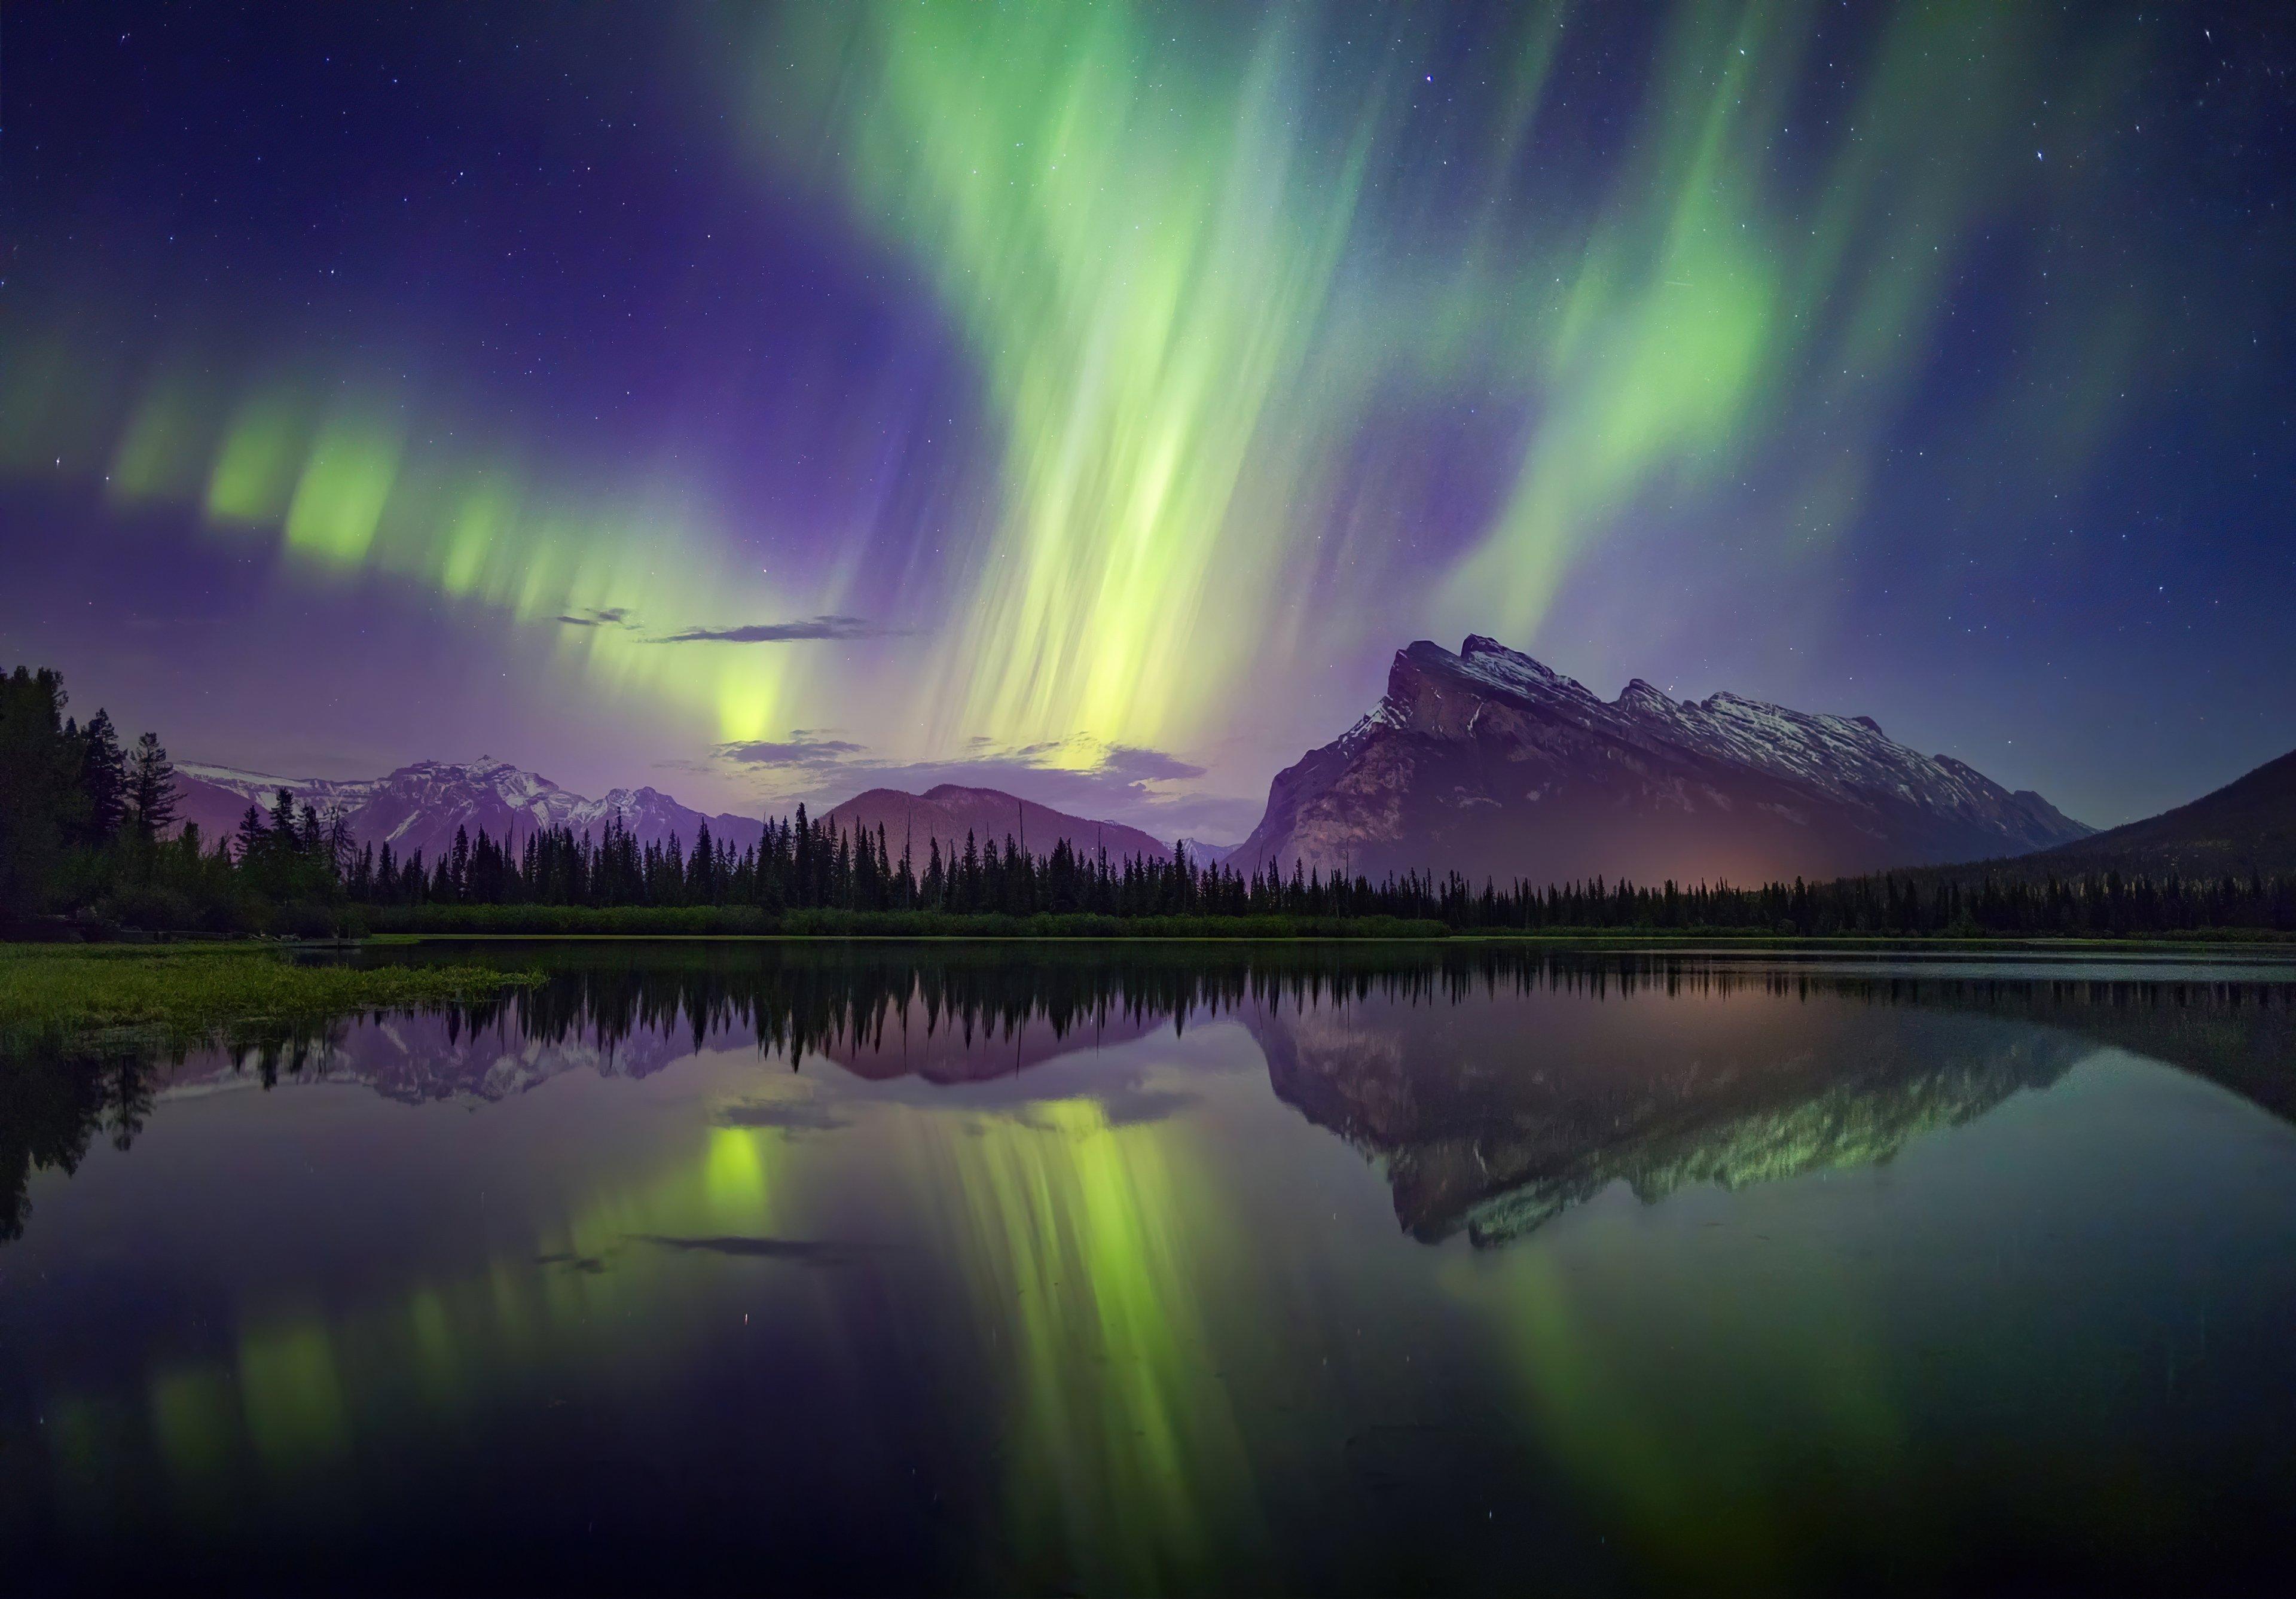 Fondos de pantalla Auroras Polares en bosque junto a lago y montañas